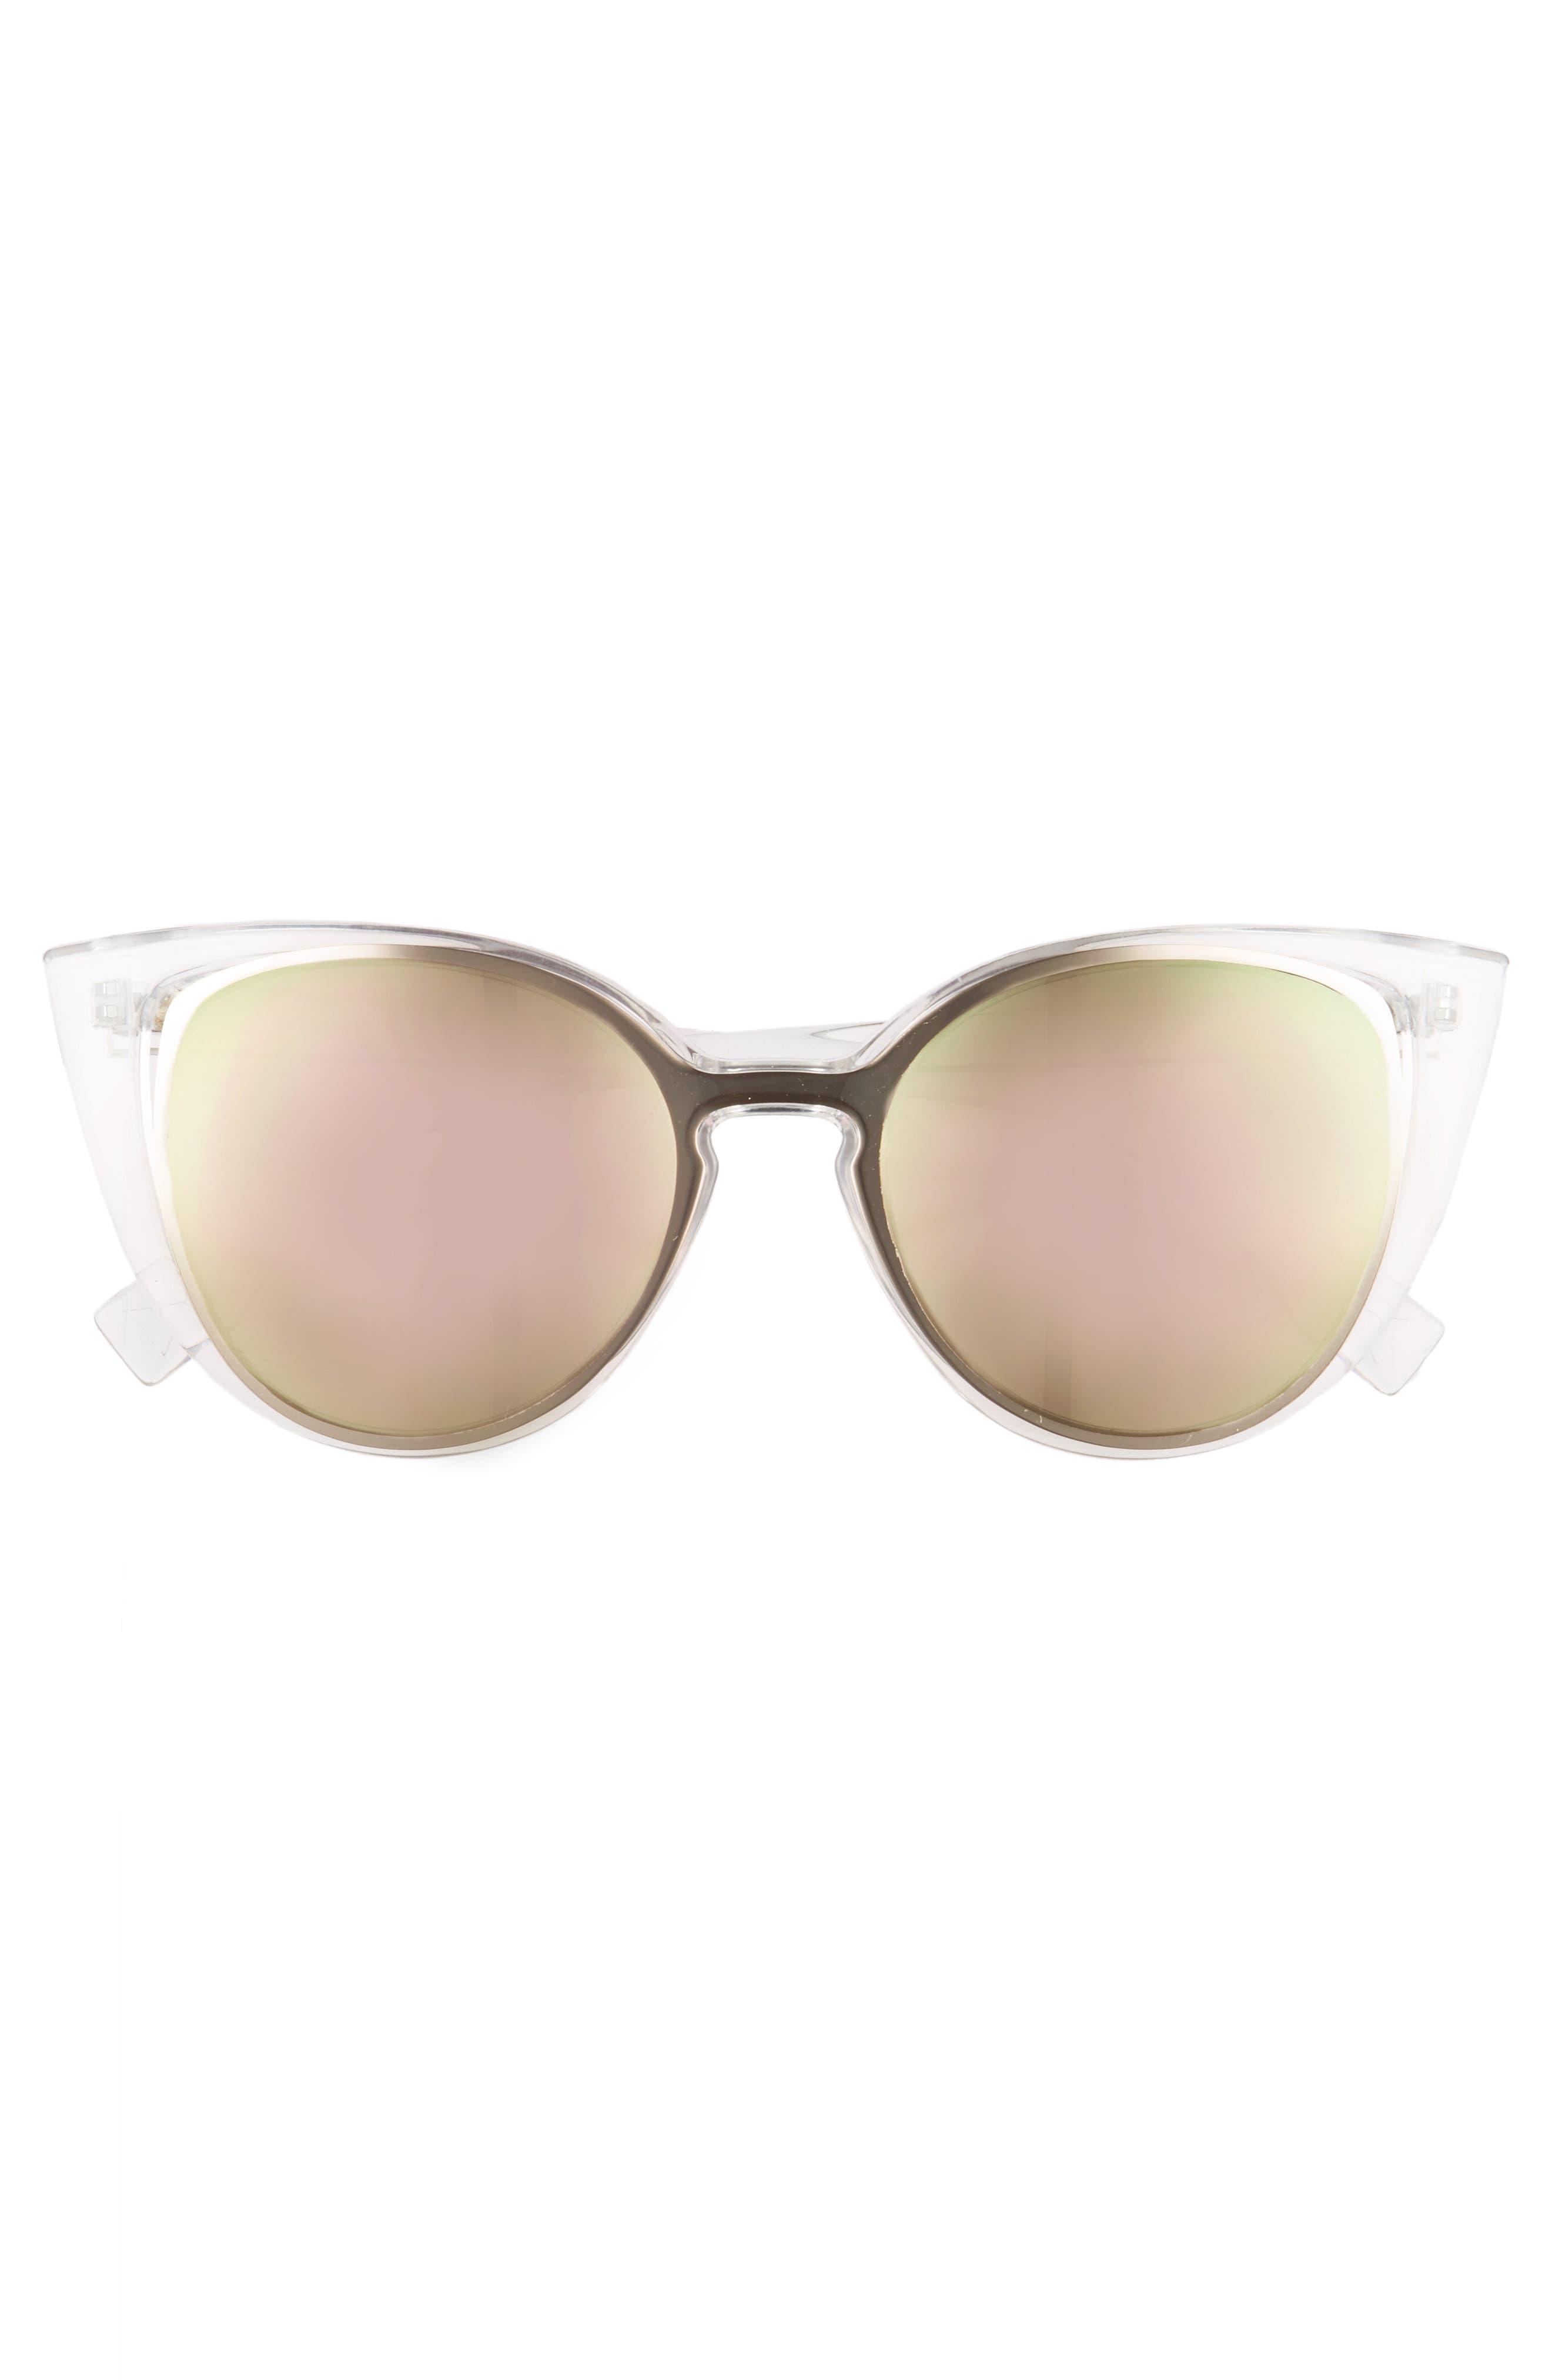 56mm Cutout Cat Eye Sunglasses,                             Alternate thumbnail 3, color,                             100